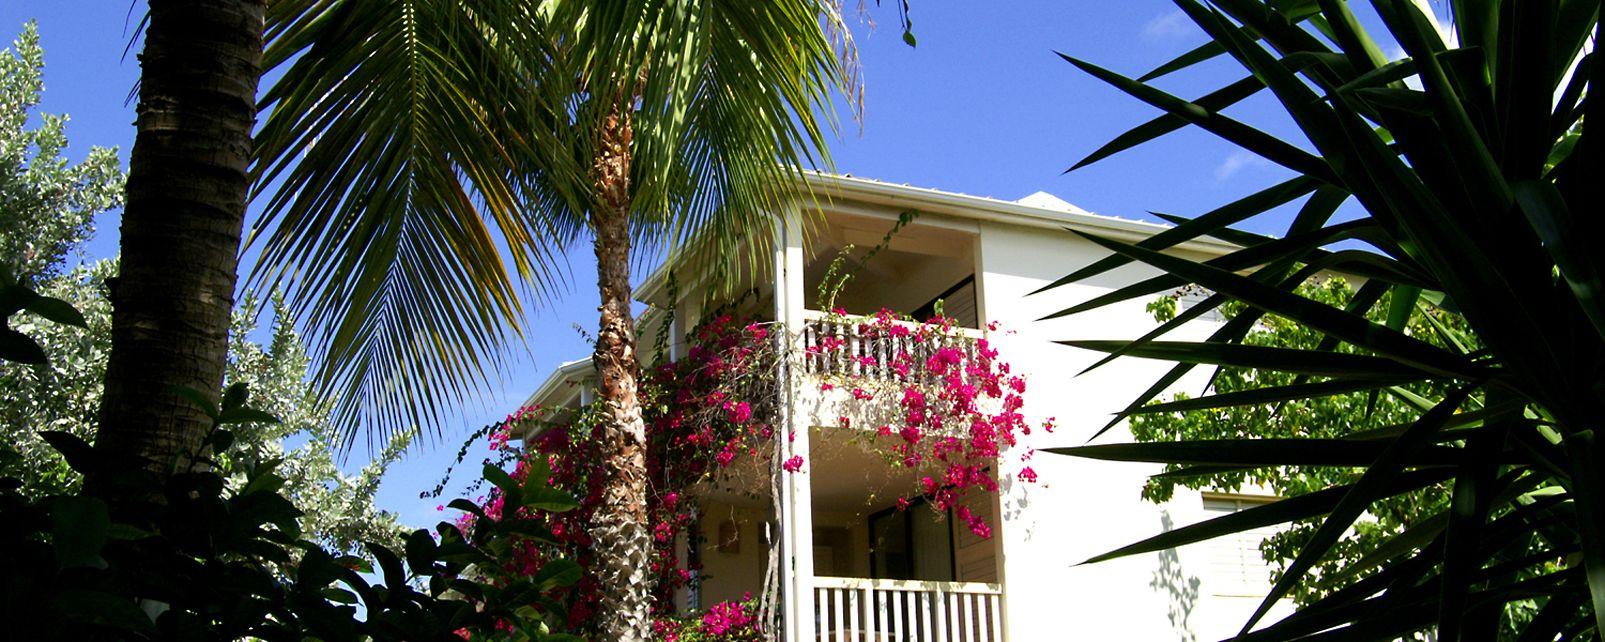 Hotel Mercure Simson Beach